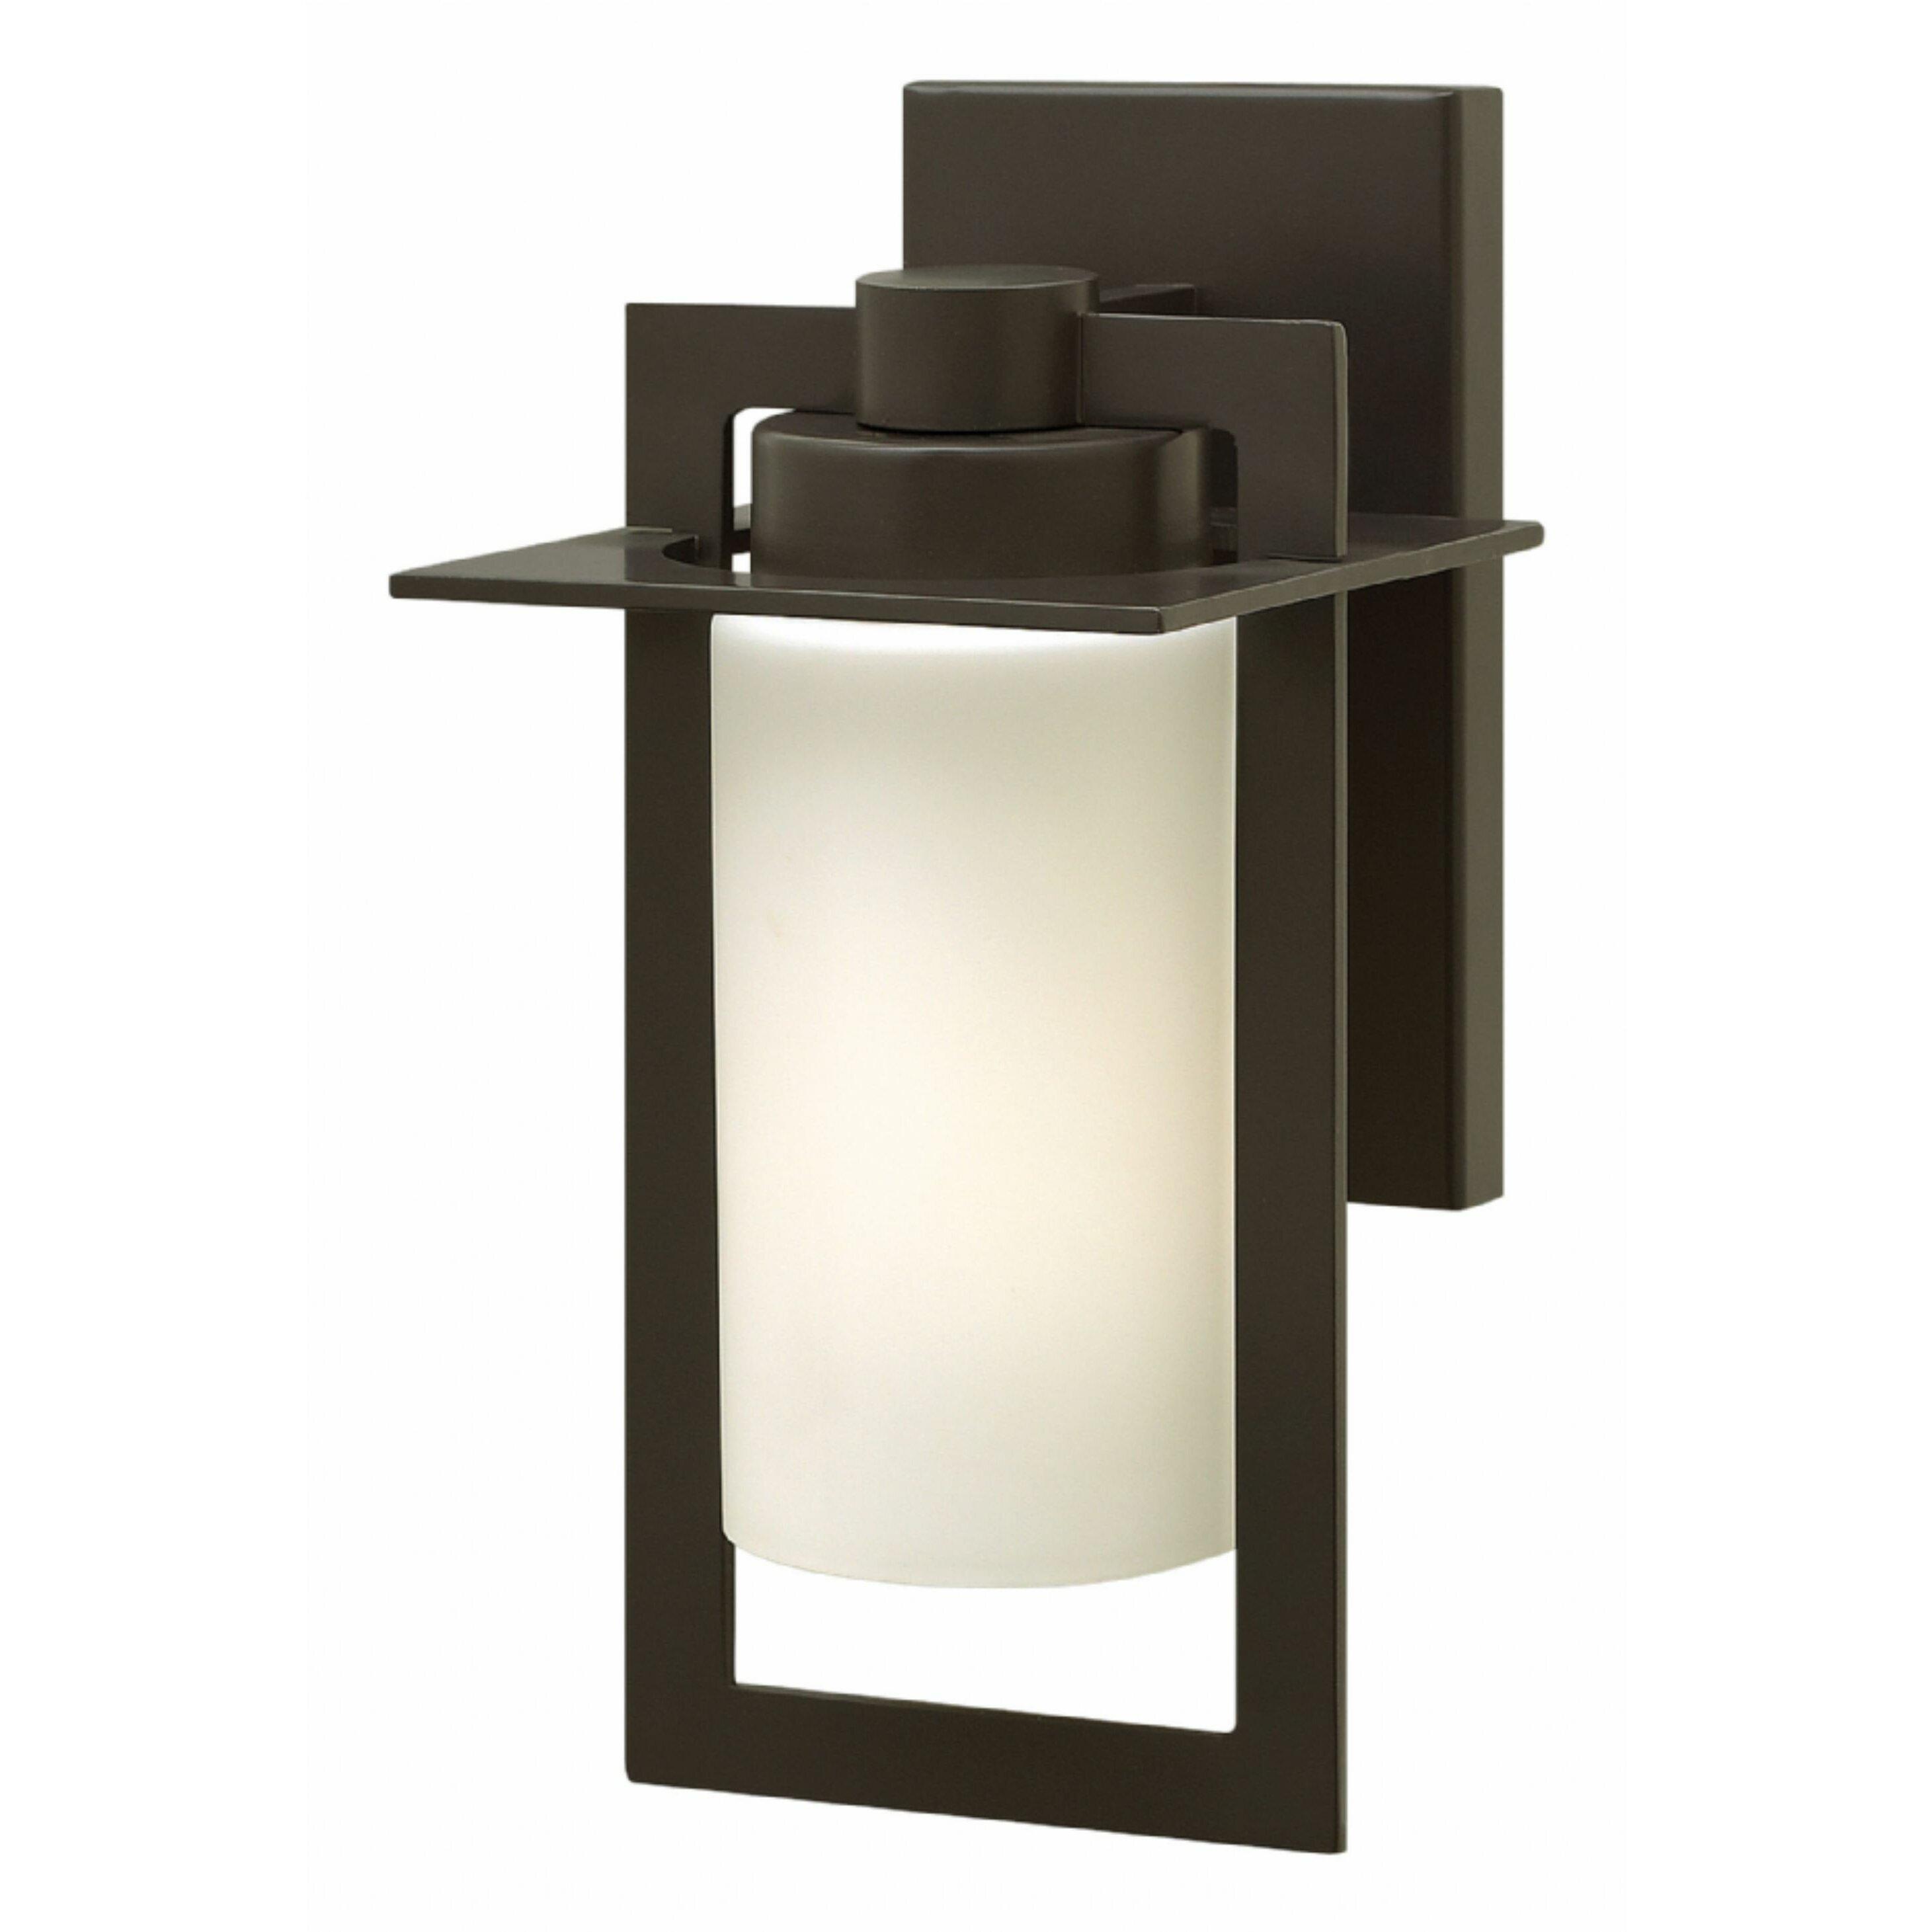 Hinkley Lighting Colfax 1 Light Outdoor Wall lantern & Reviews Wayfair